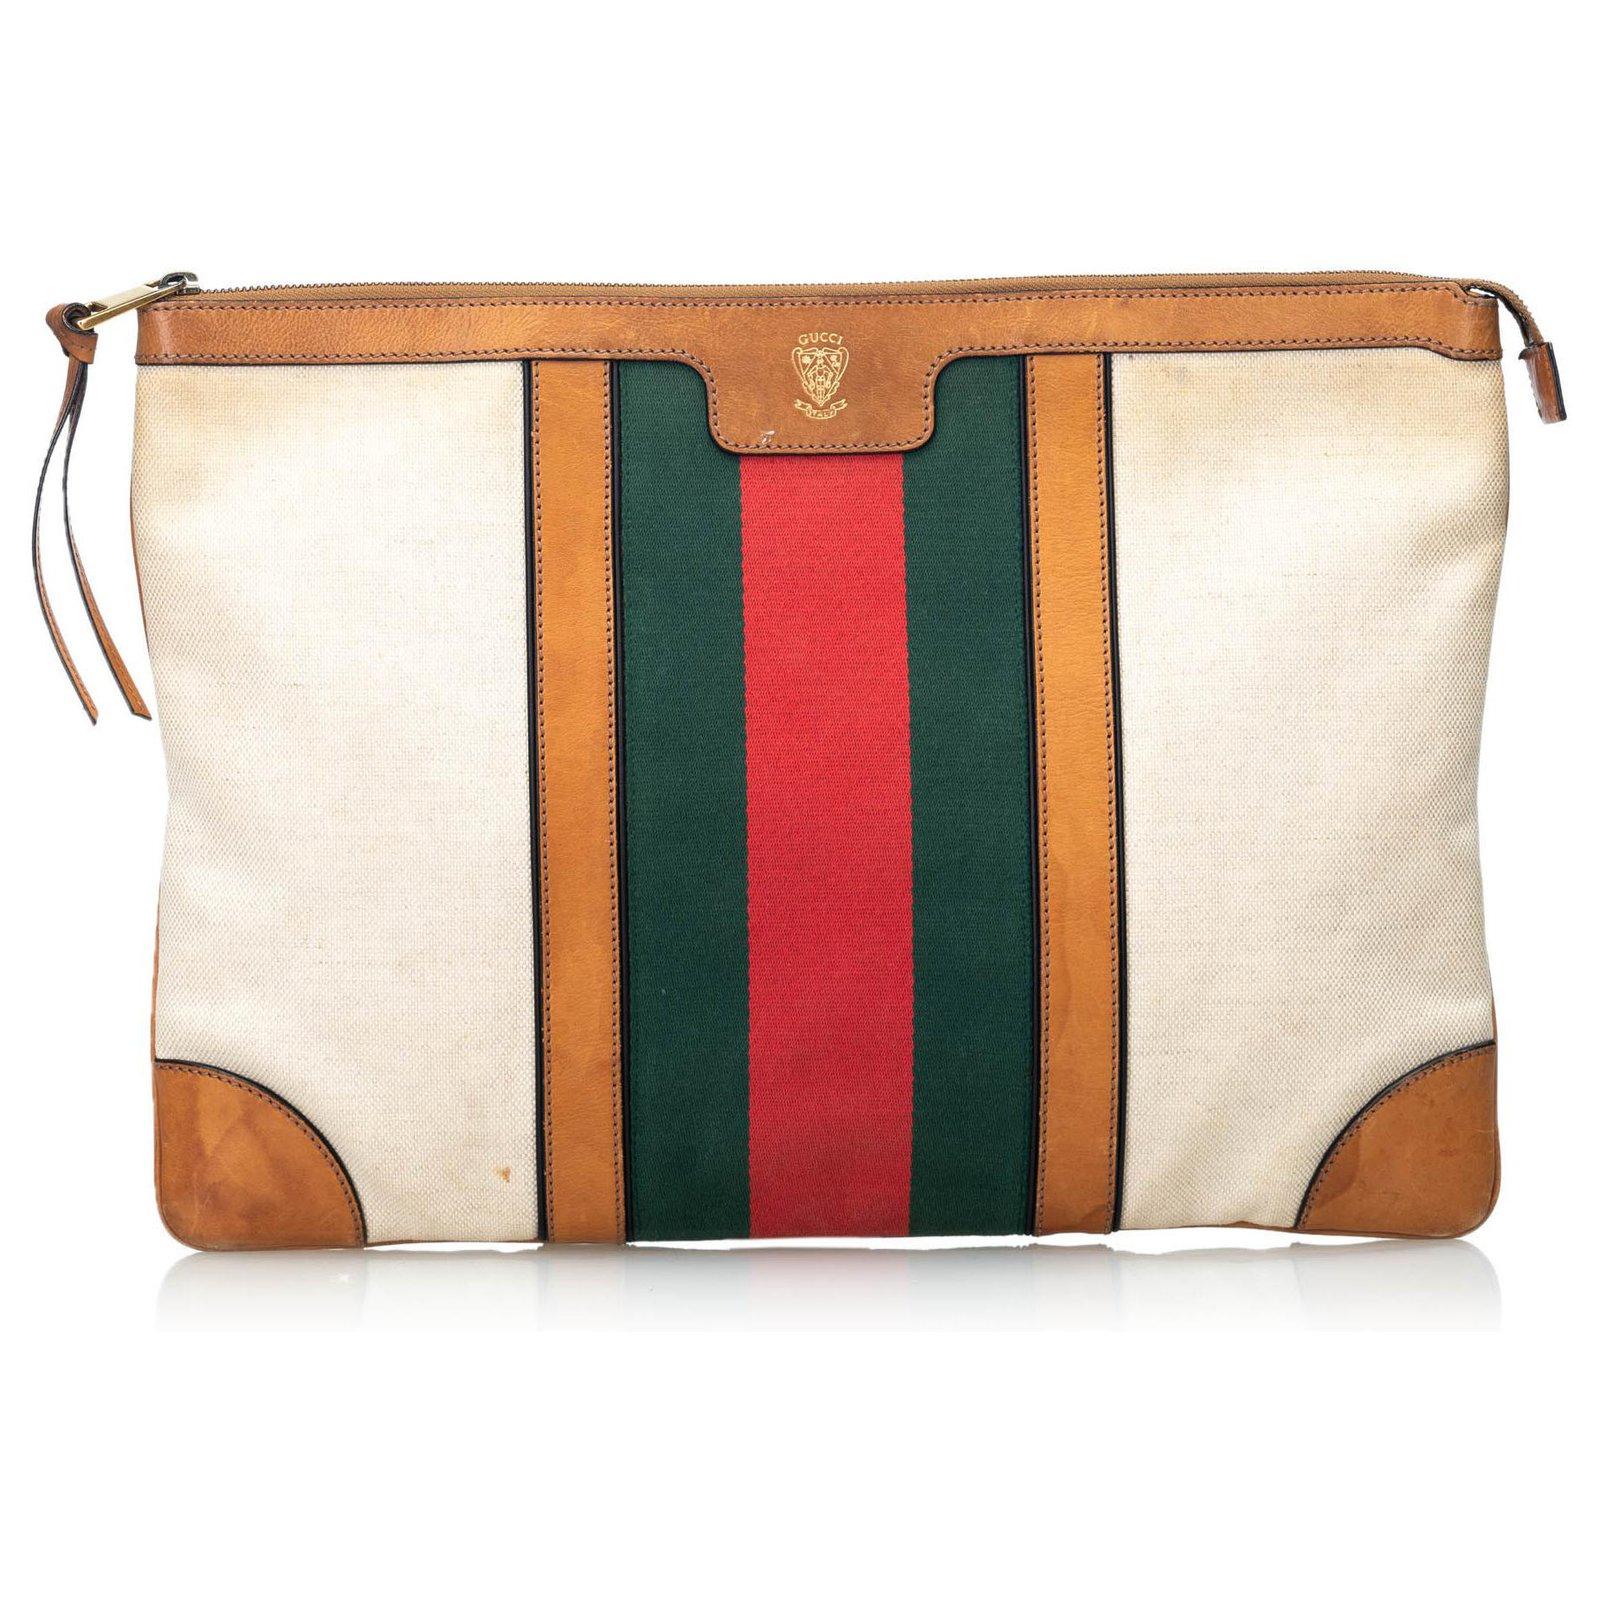 0fd9ab5f3fd Gucci Gucci White Web Canvas Portfolio Clutch Bag Clutch bags  Leather